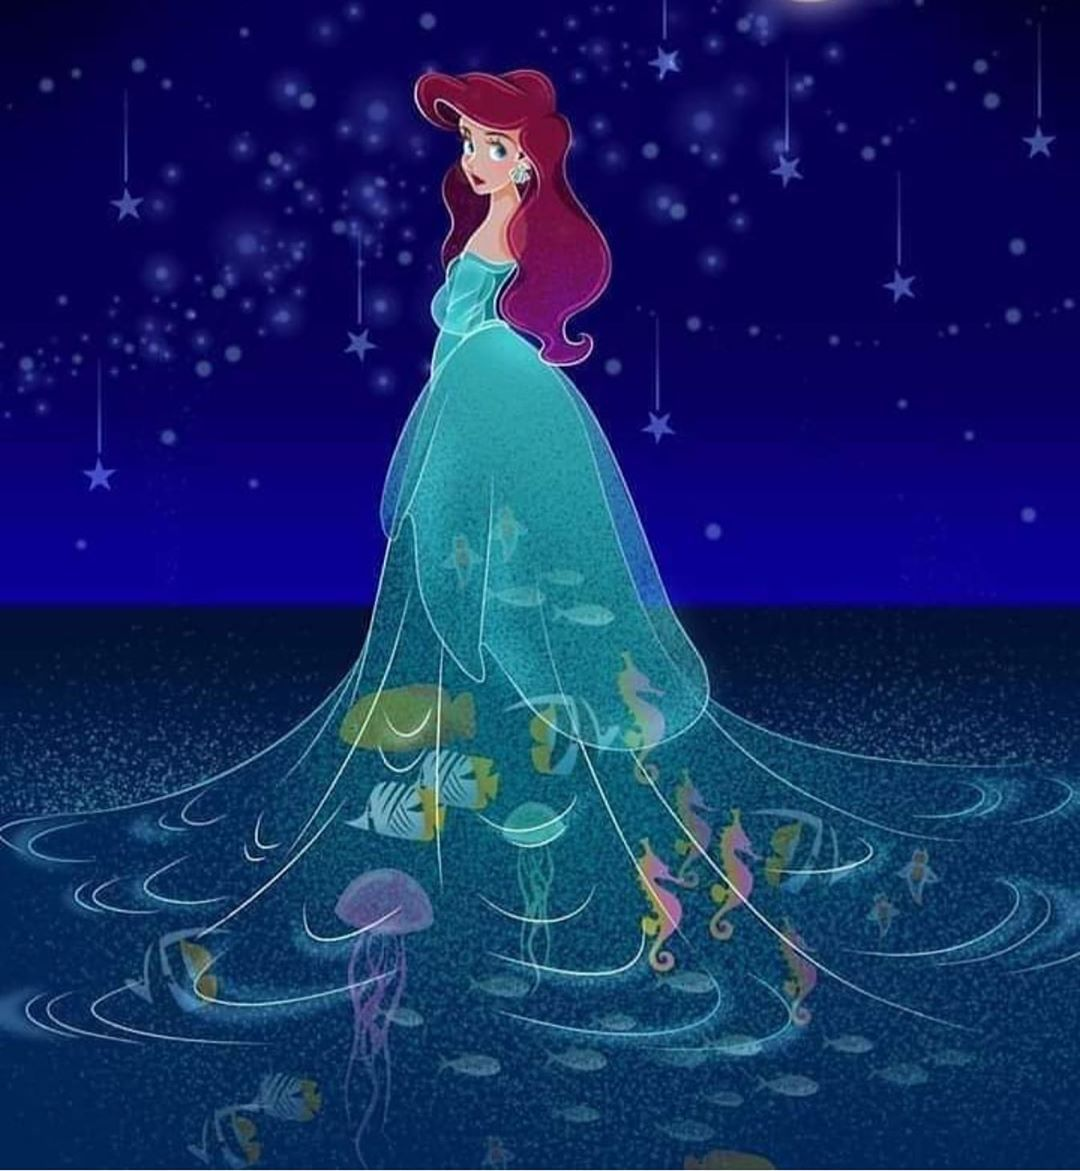 the_little_mermaid_world мεямαι∂ ℓιғε Such Beauty